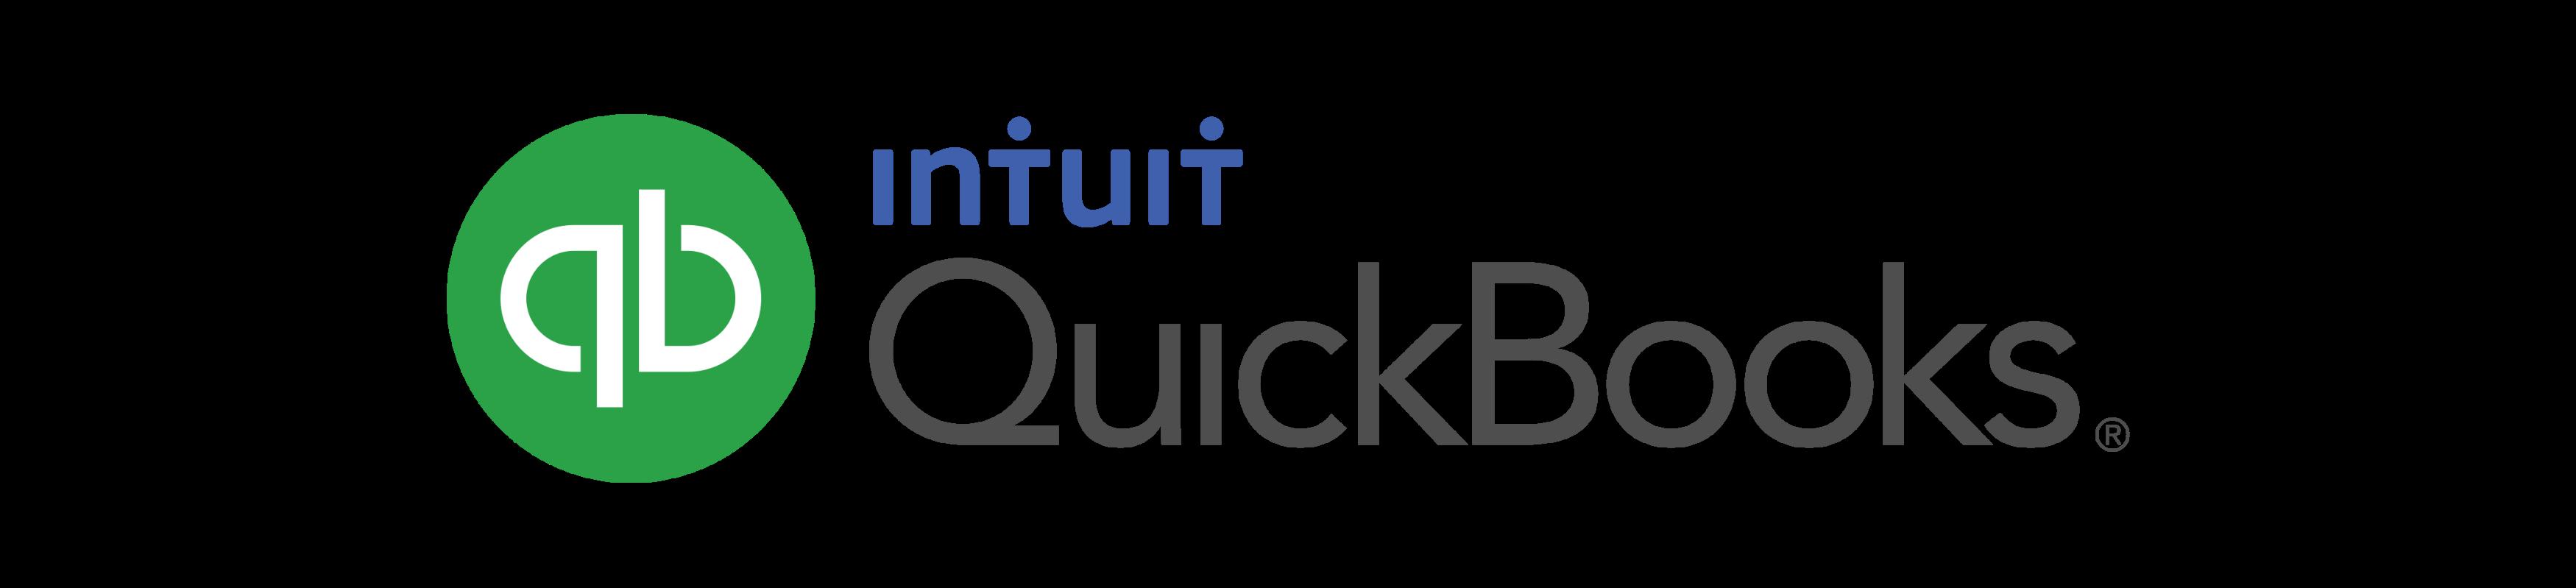 intuit-quickbooks-followup-crm-integration